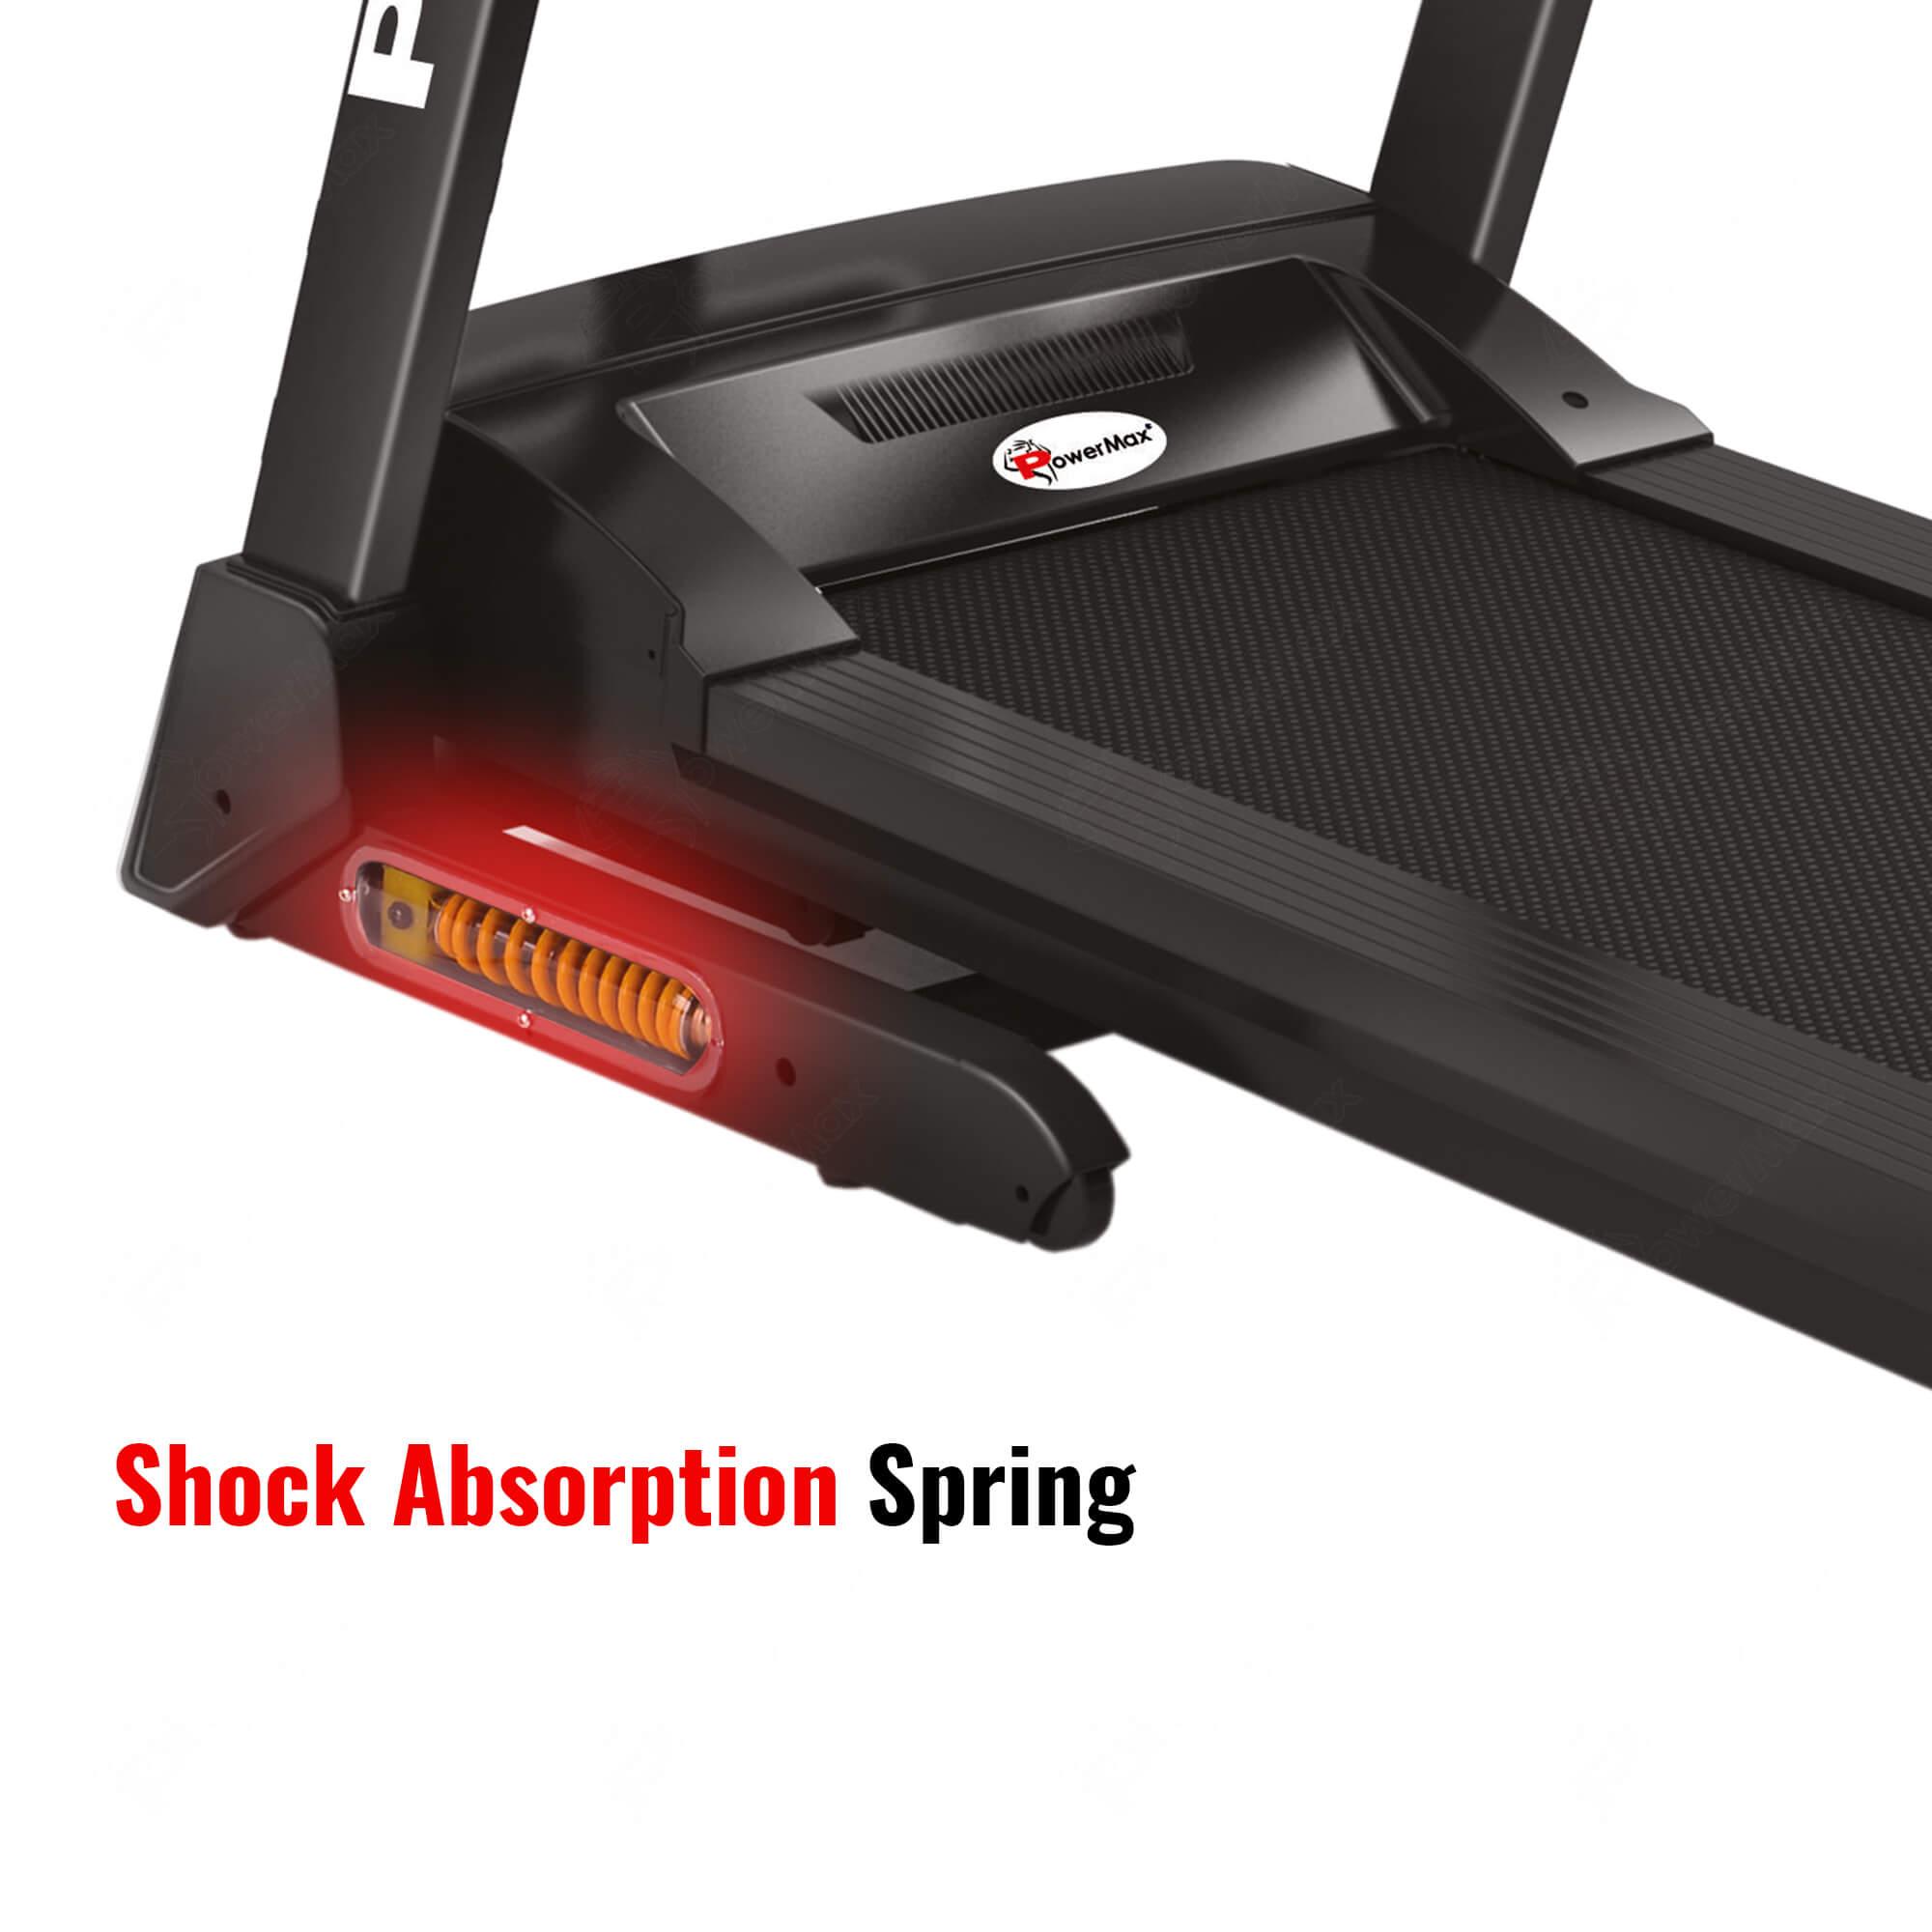 TDM-110S® Motorized Treadmill with Semi-Auto Lubrication